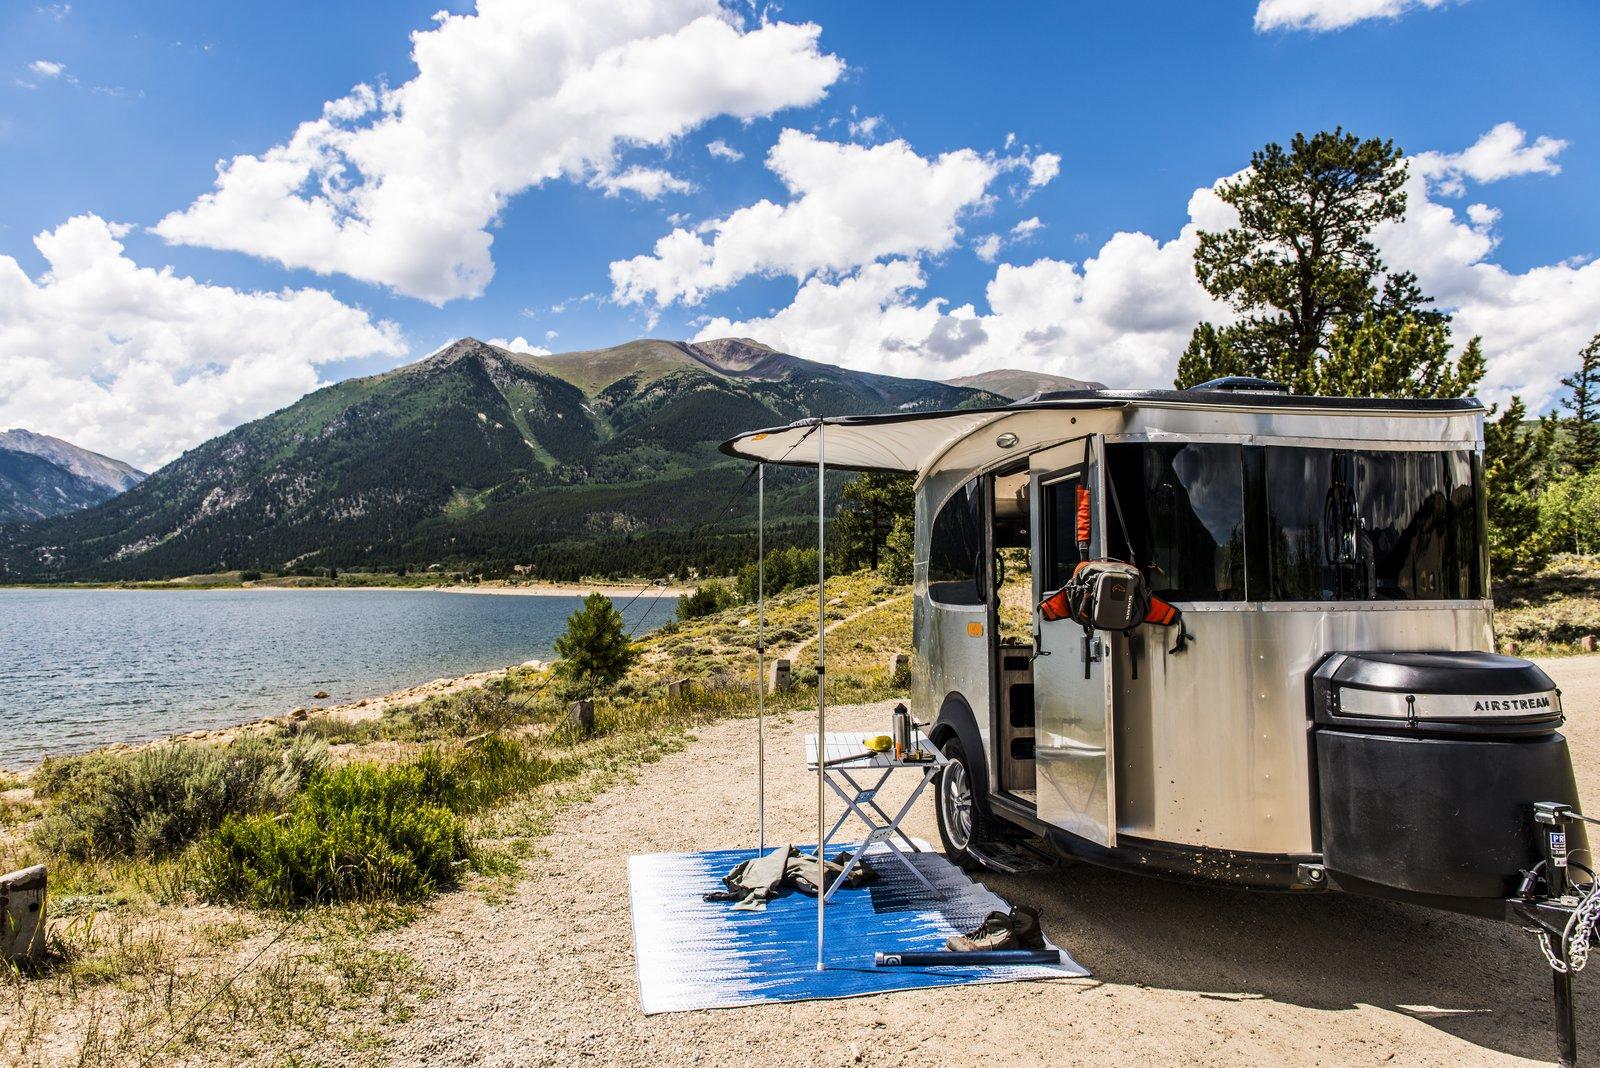 Airstream basecamp camper exterior